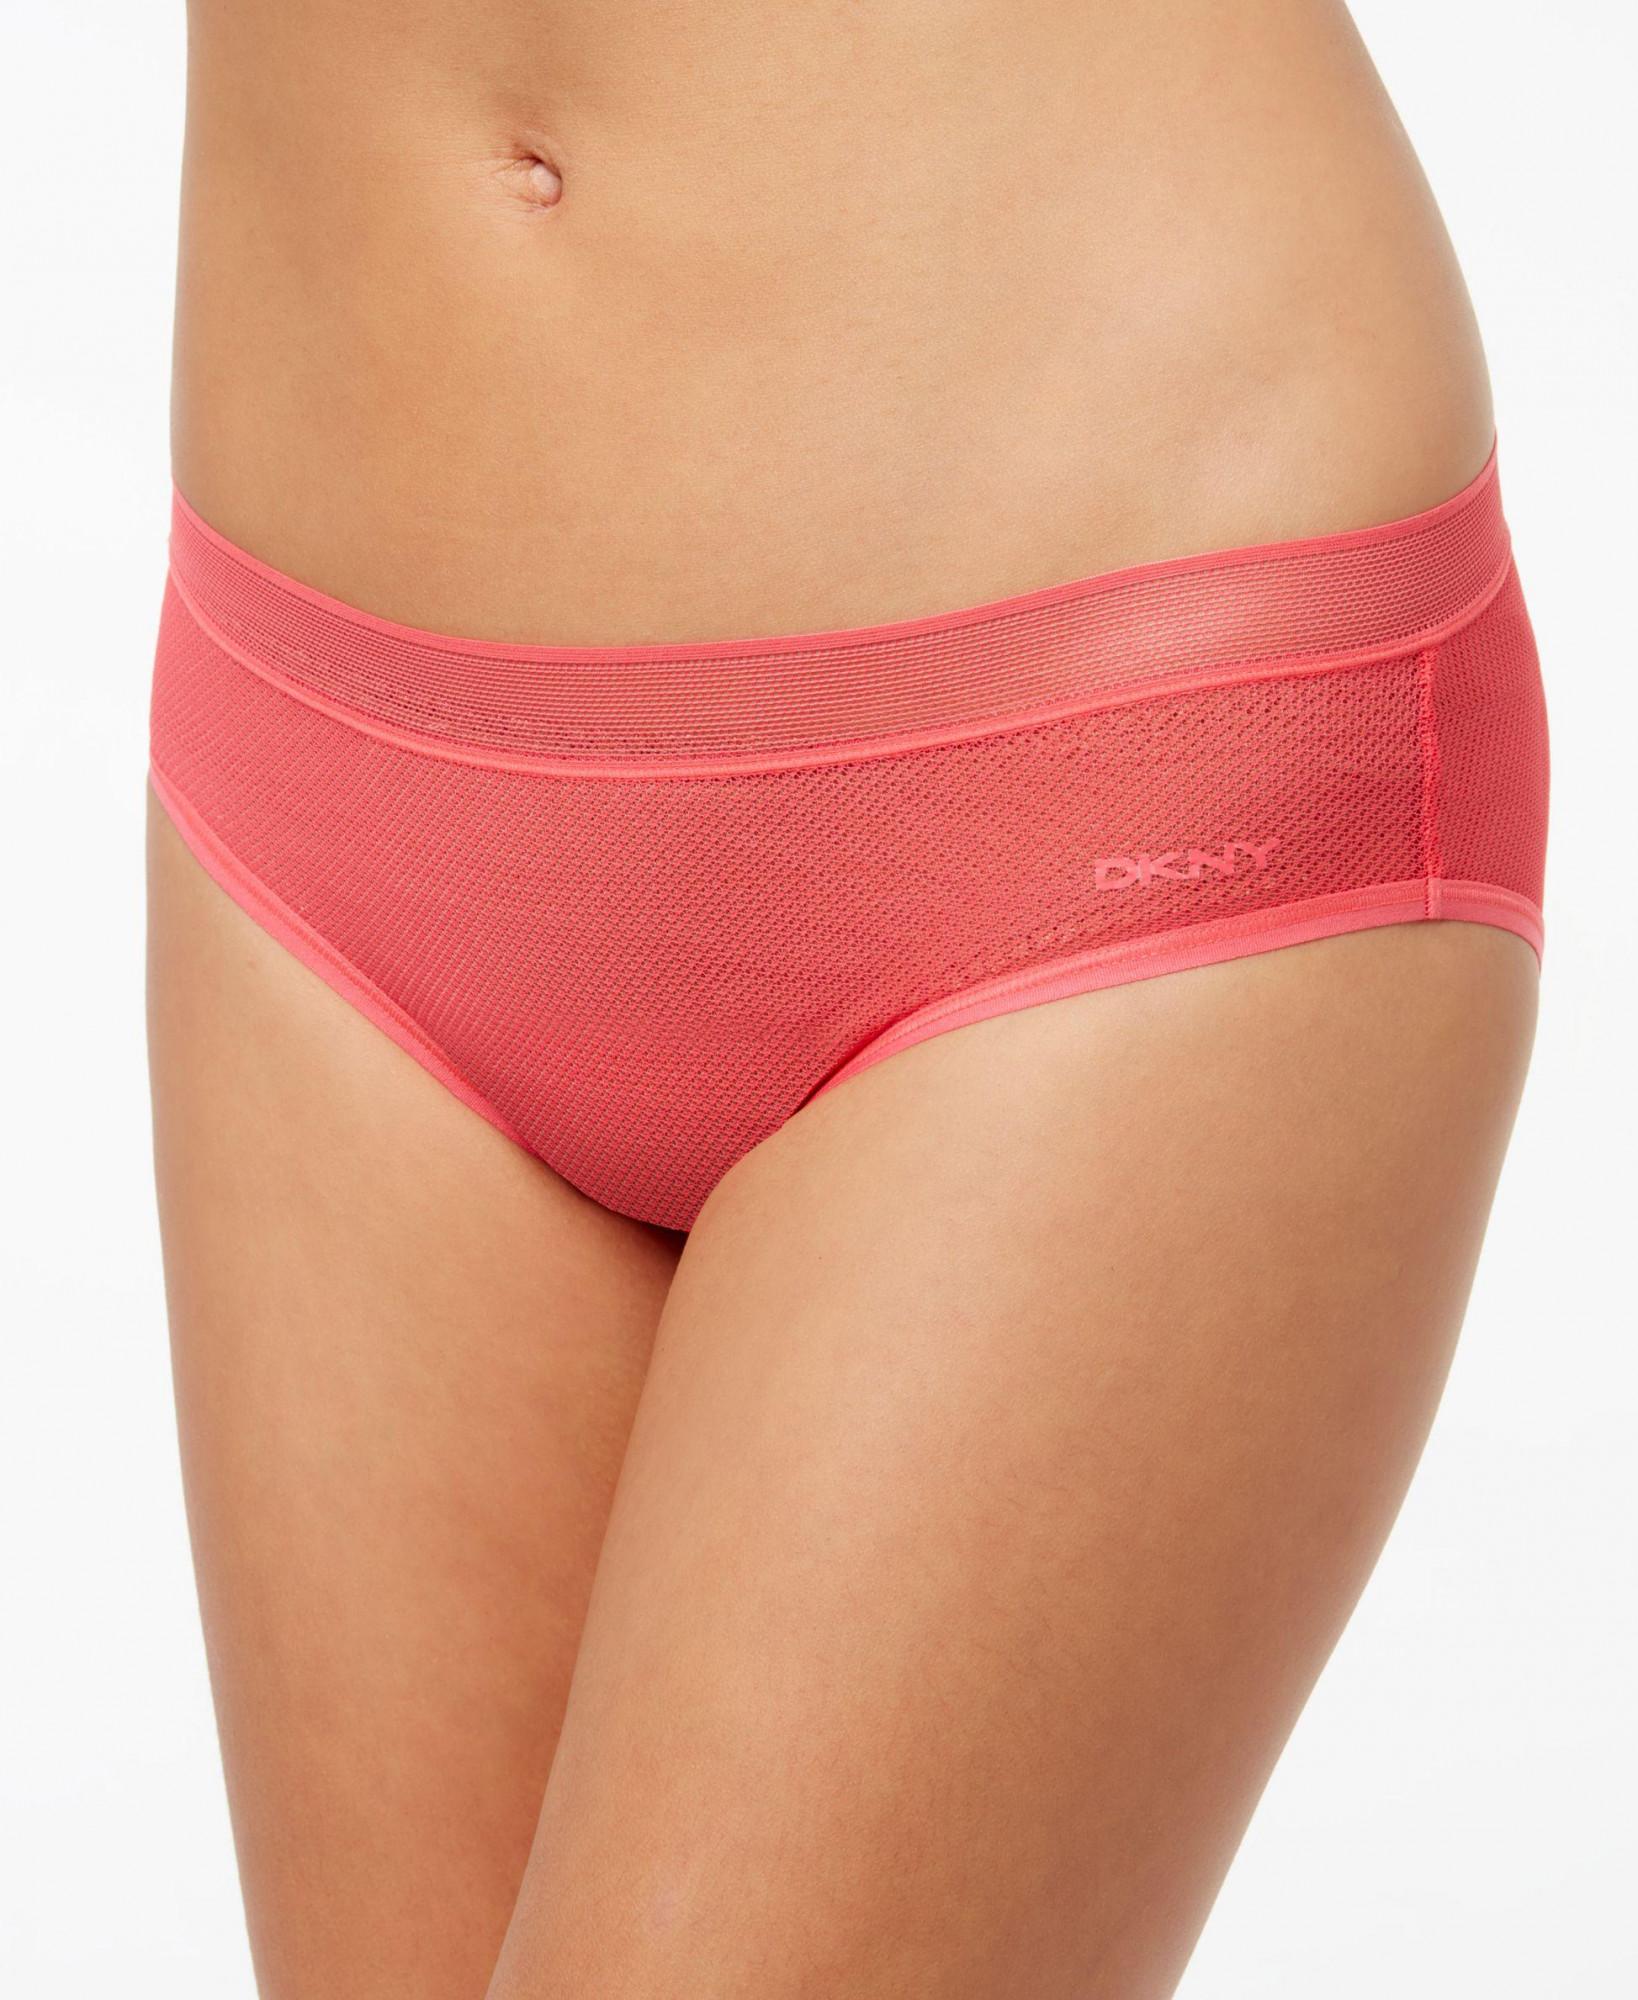 Kalhotky DK1030 Barva: lososová, Velikost: S